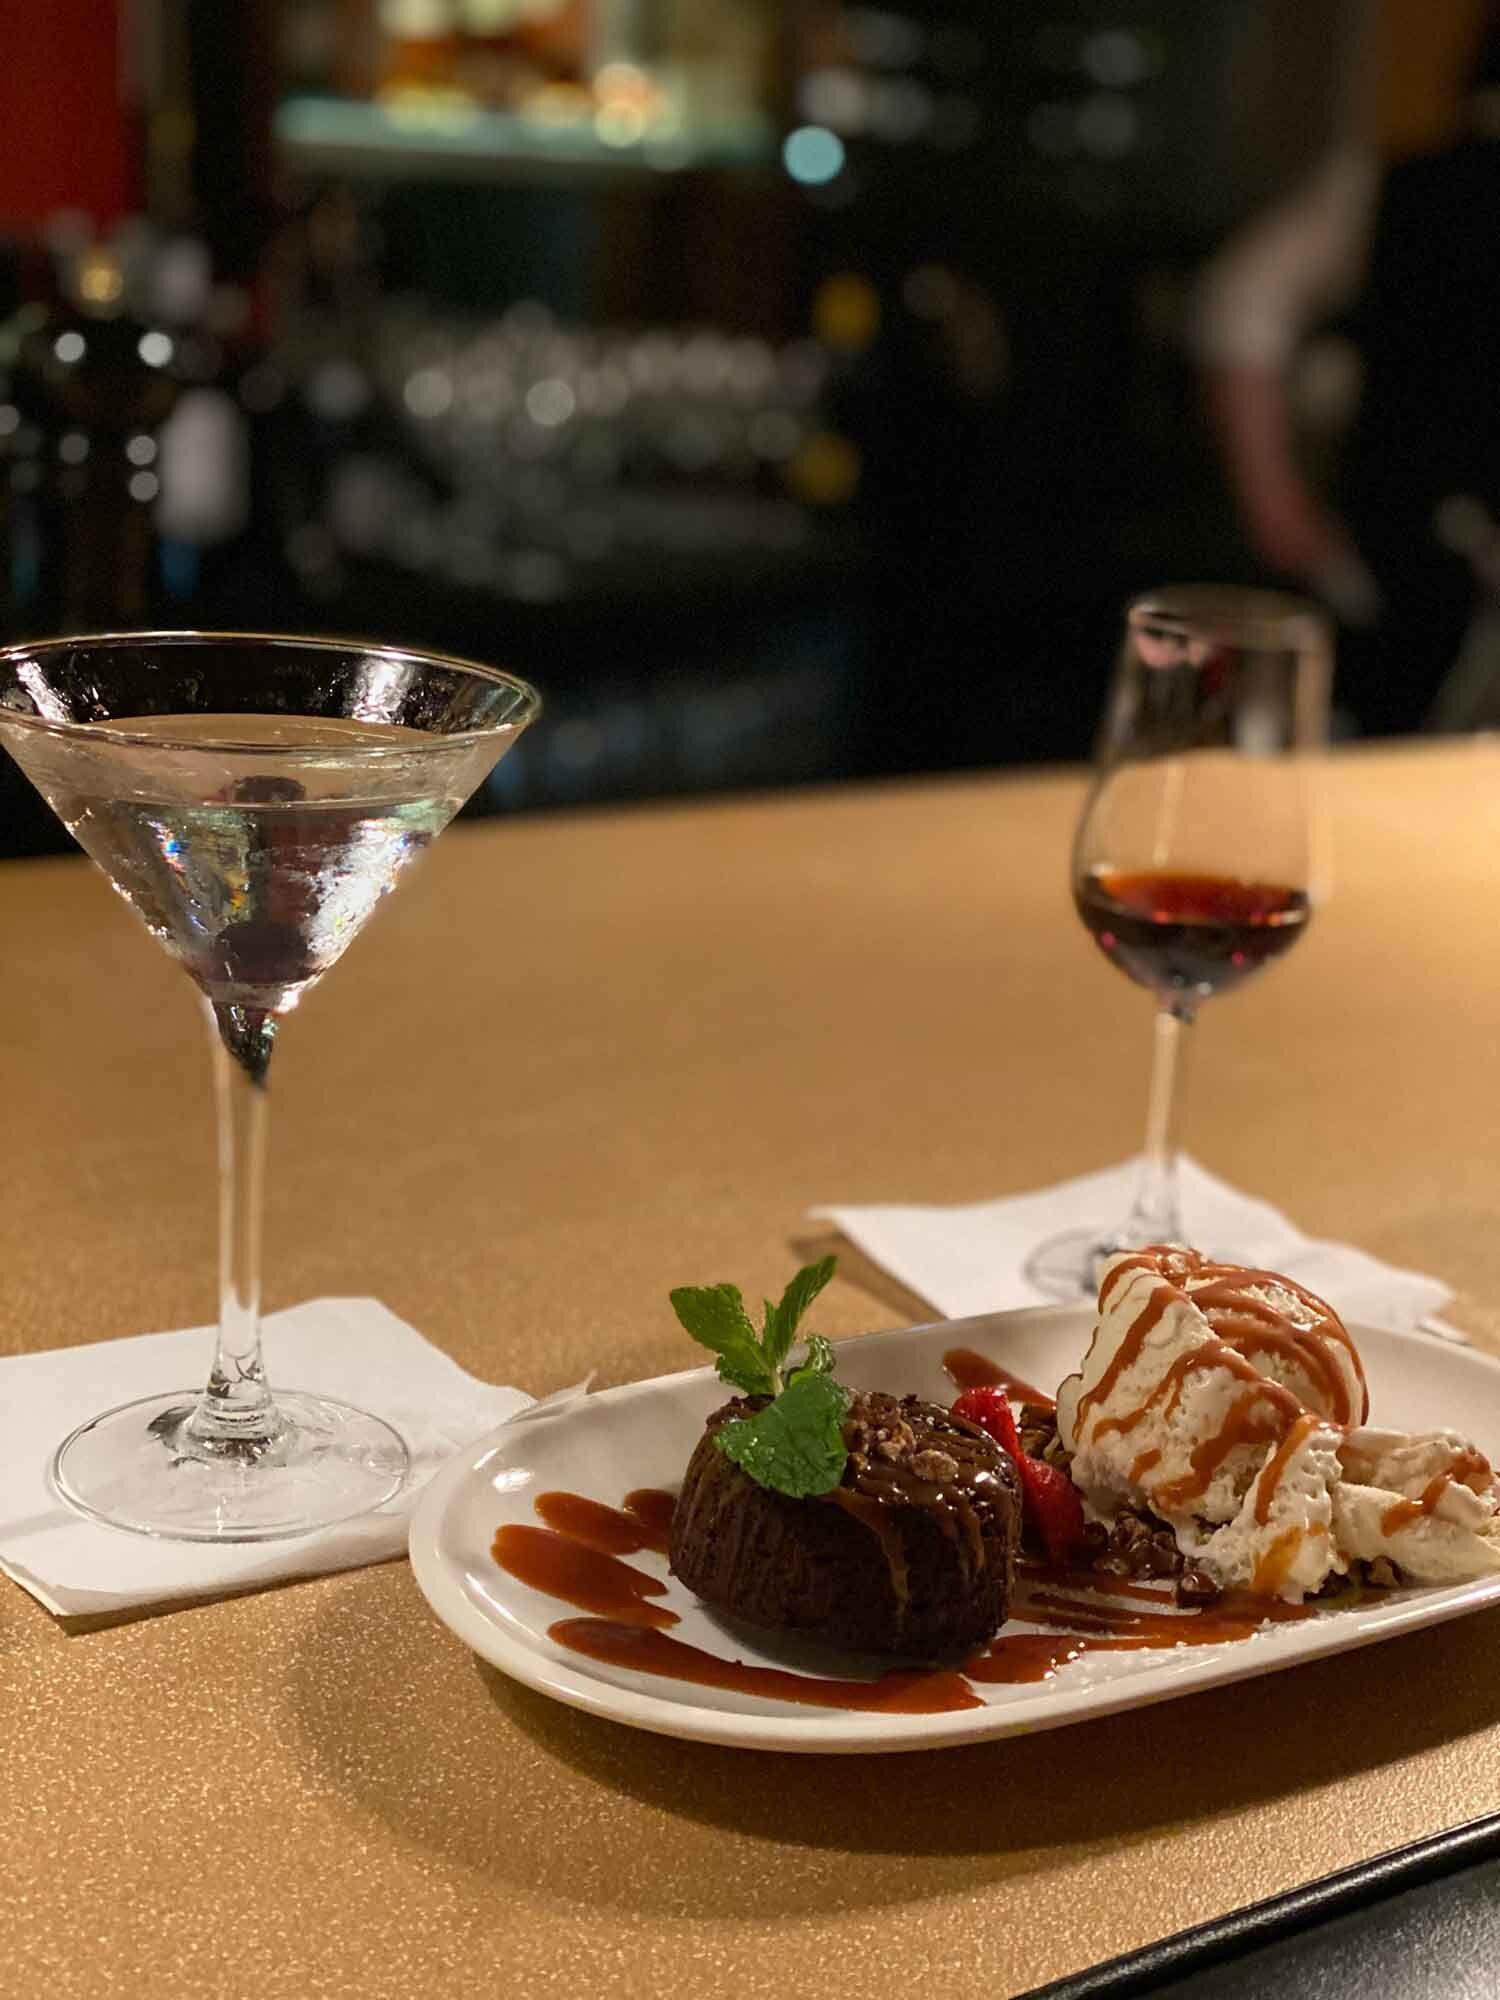 Business travel dinner out Molten chocolate cake icecream dessert martini